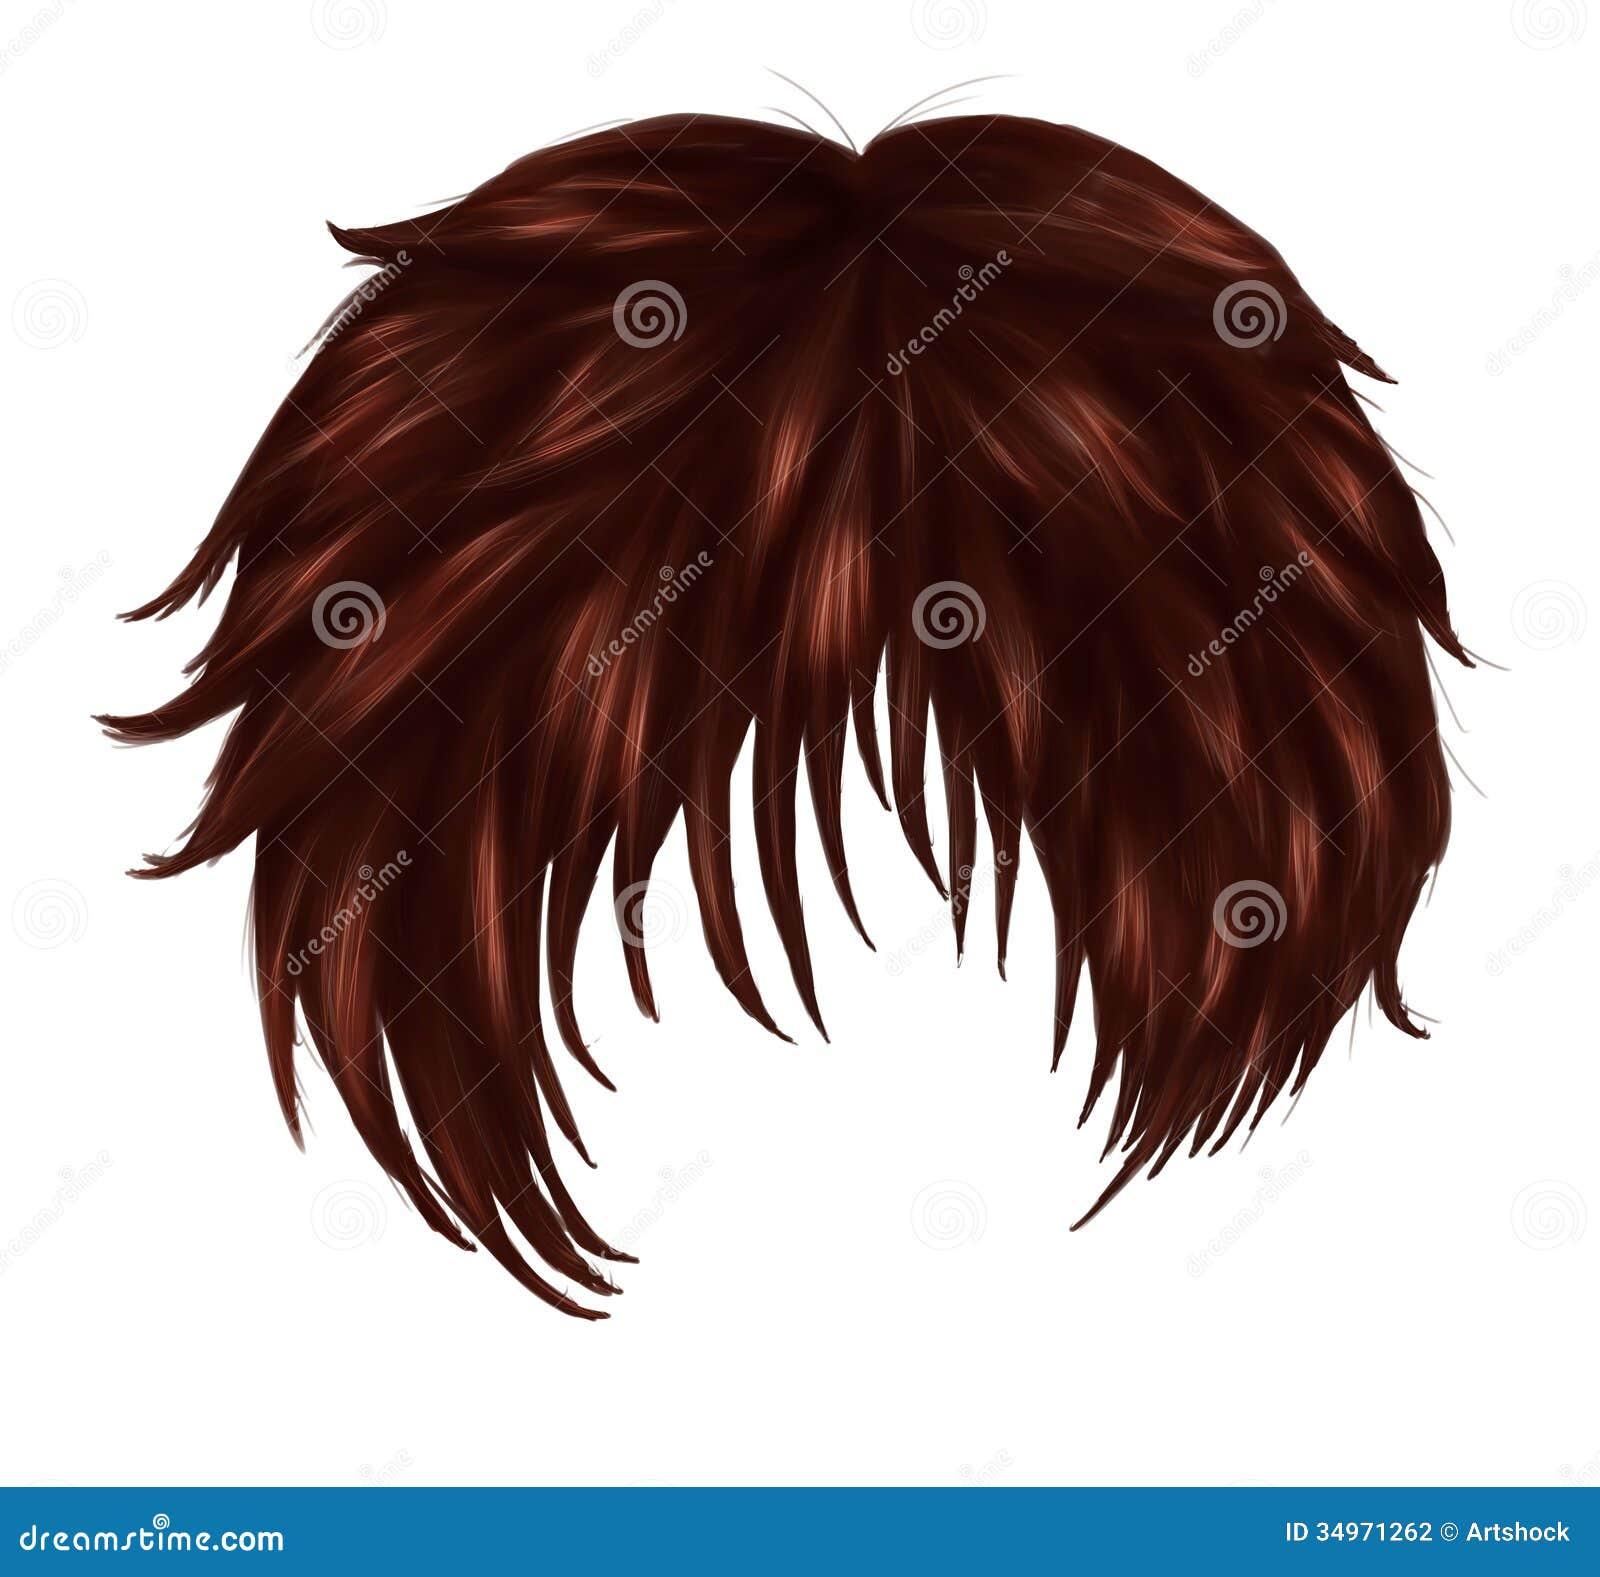 anime brown hair stock illustration illustration of hairdo 34971262